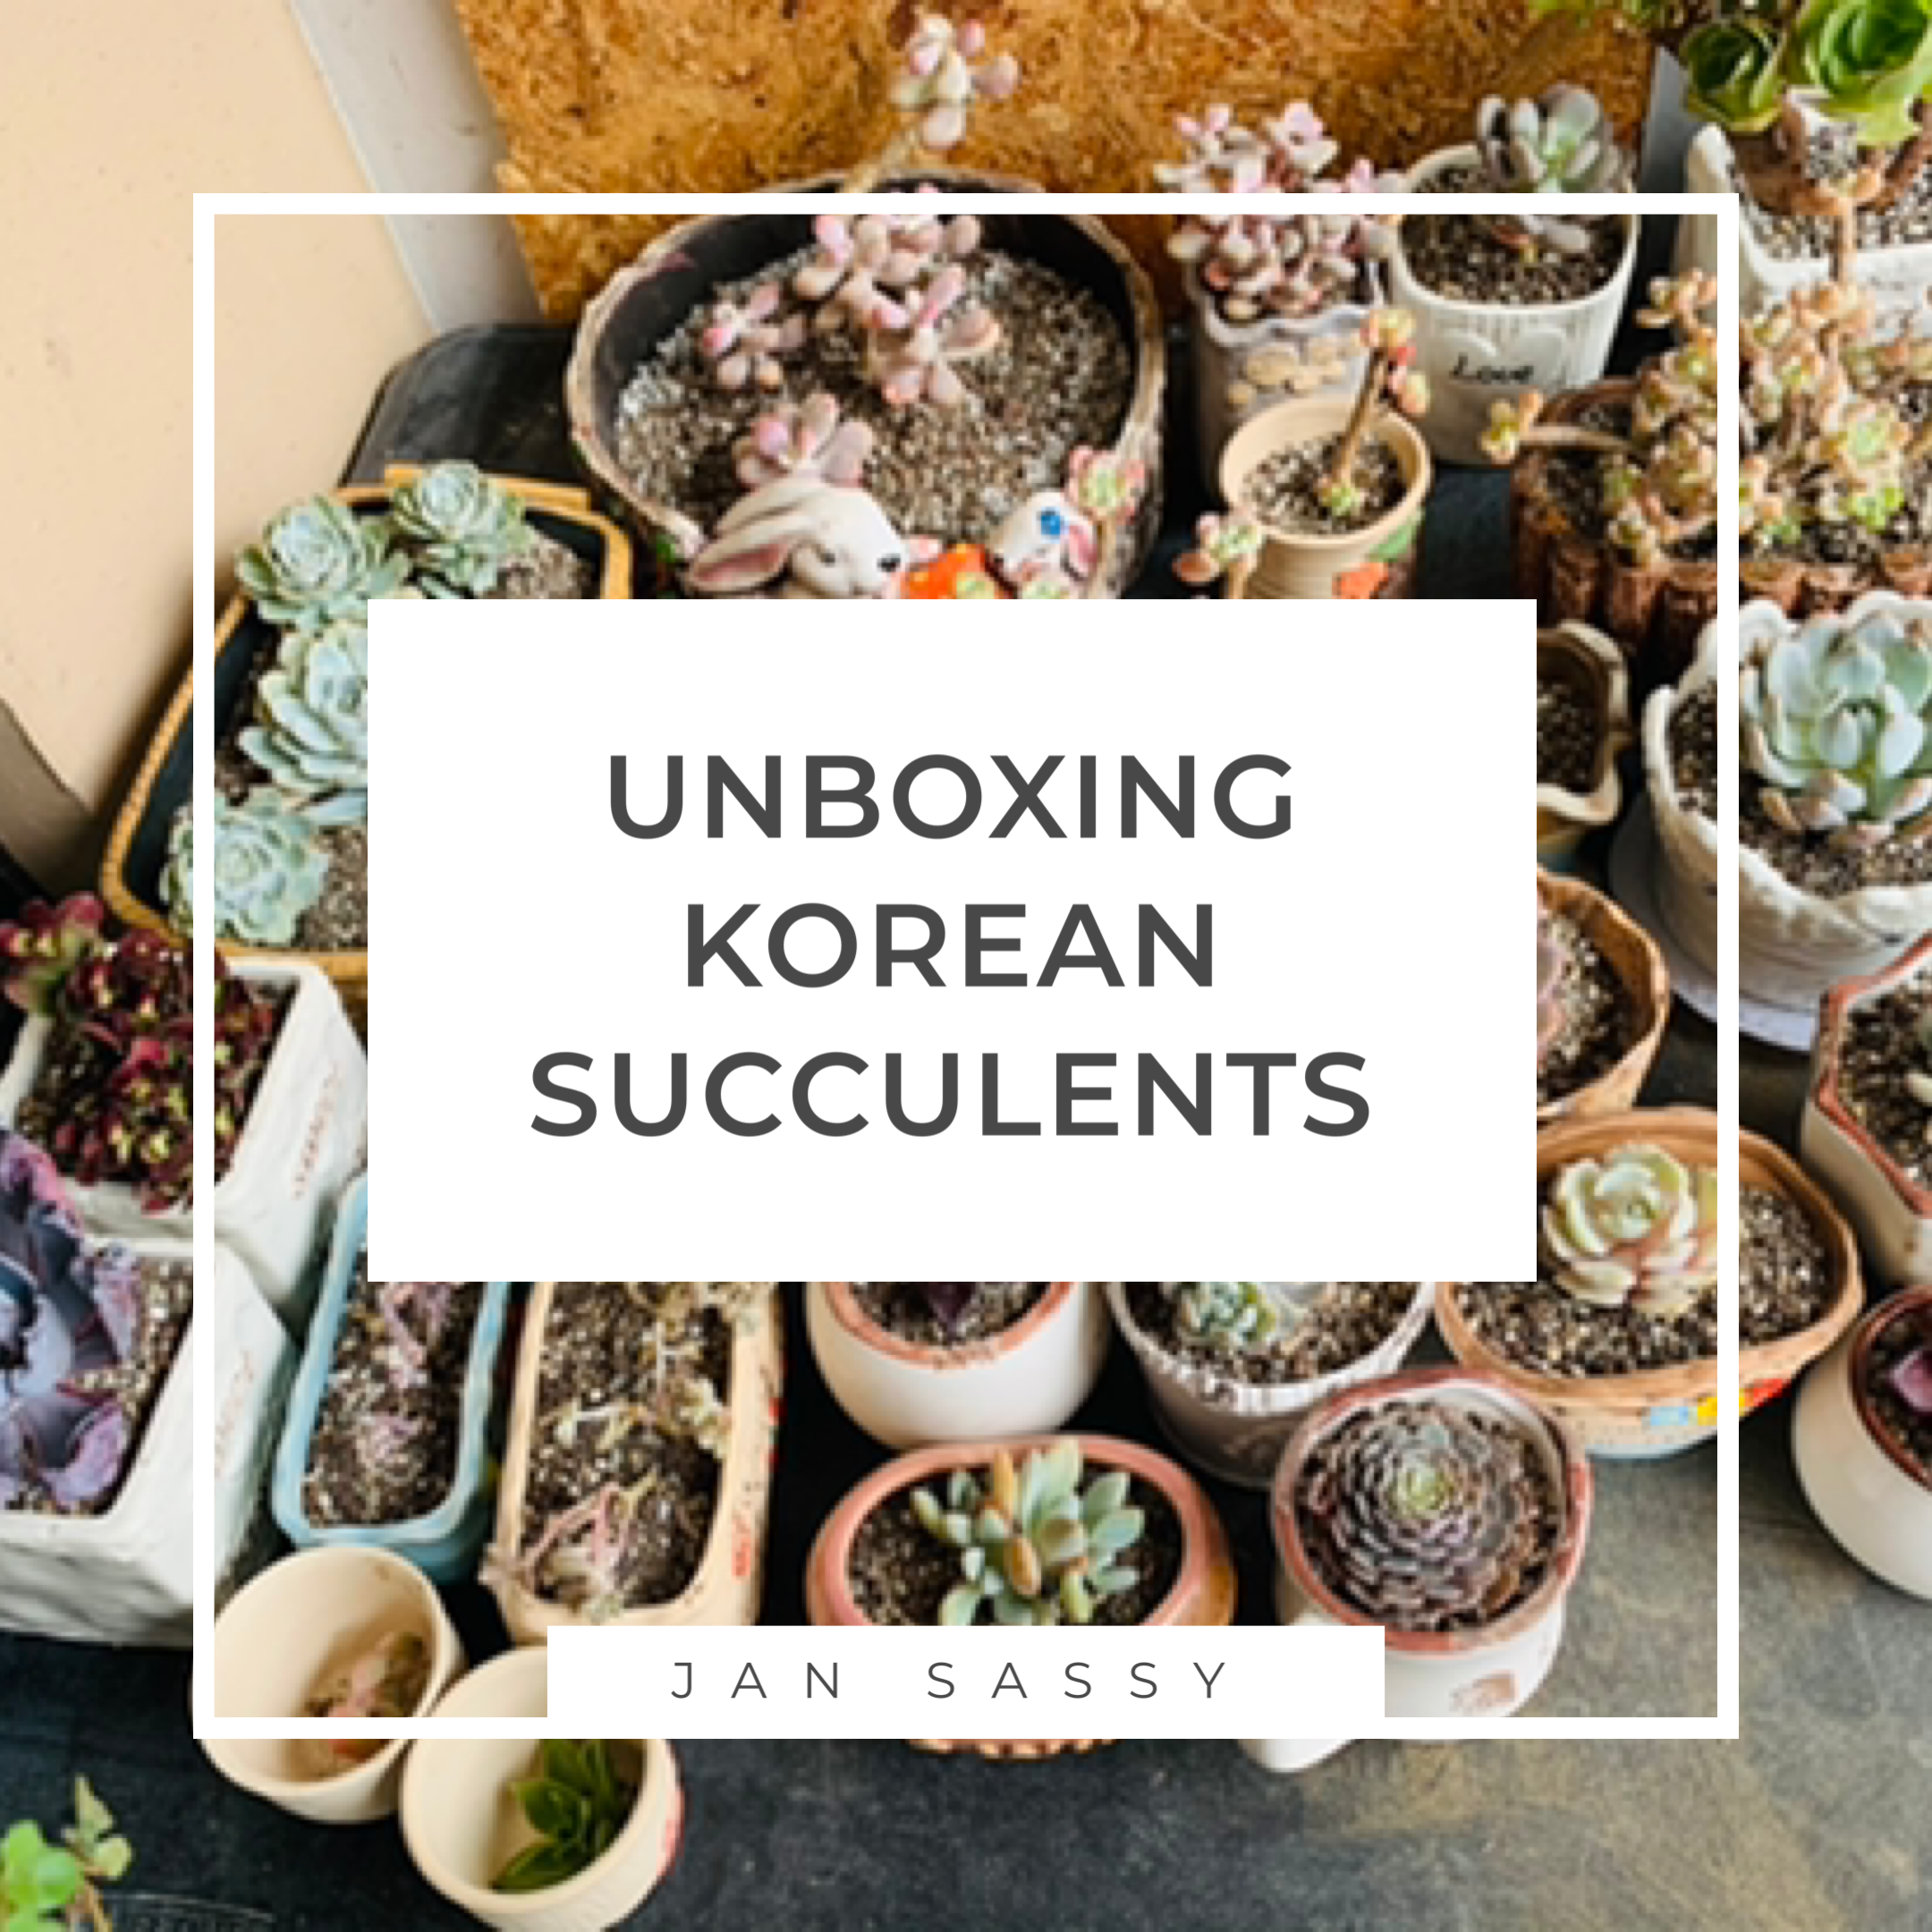 Unboxing Korean Succulents